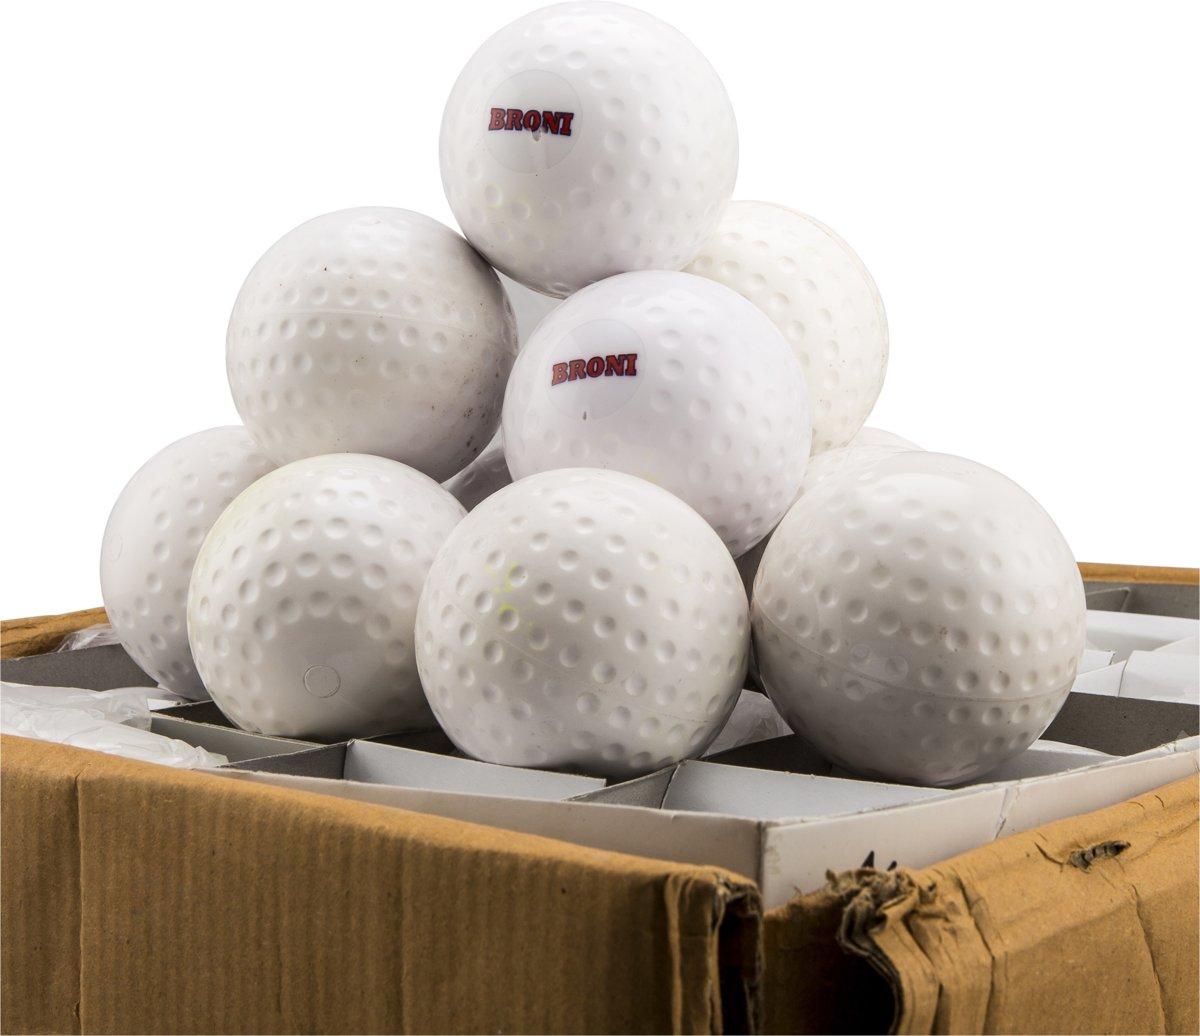 Hockeyballen Broni Dimple - wit - 120 stuks kopen